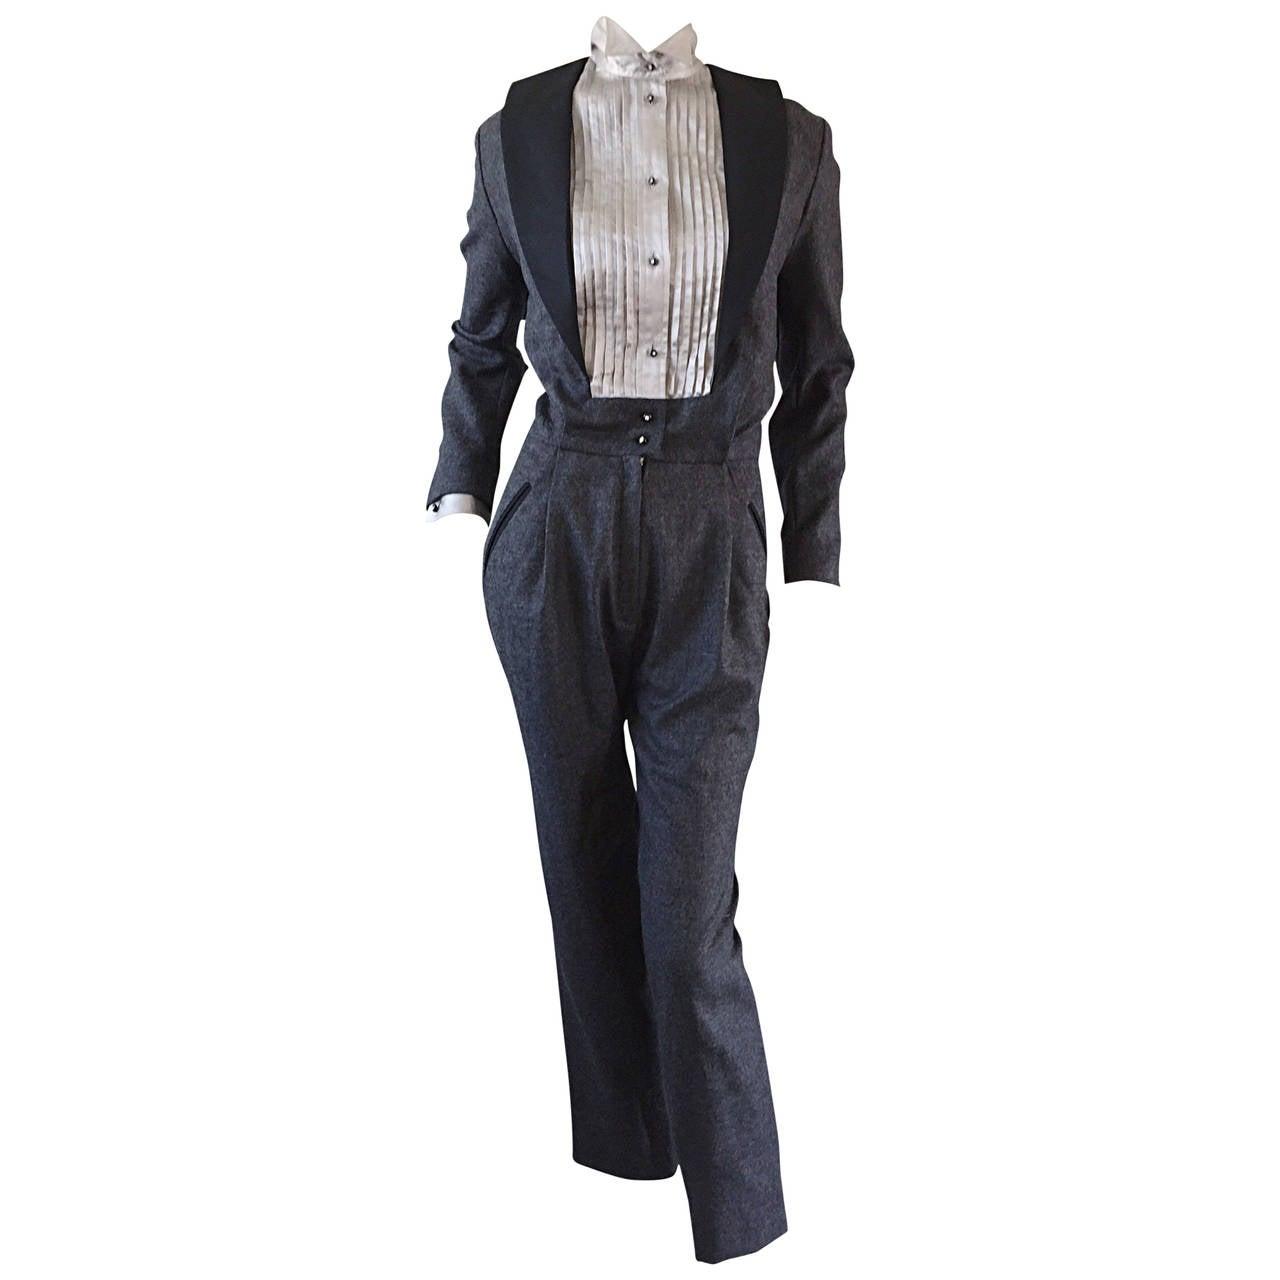 Rare Early Alberta Ferretti Charcoal Gray Vintage Tuxedo Jumpsuit